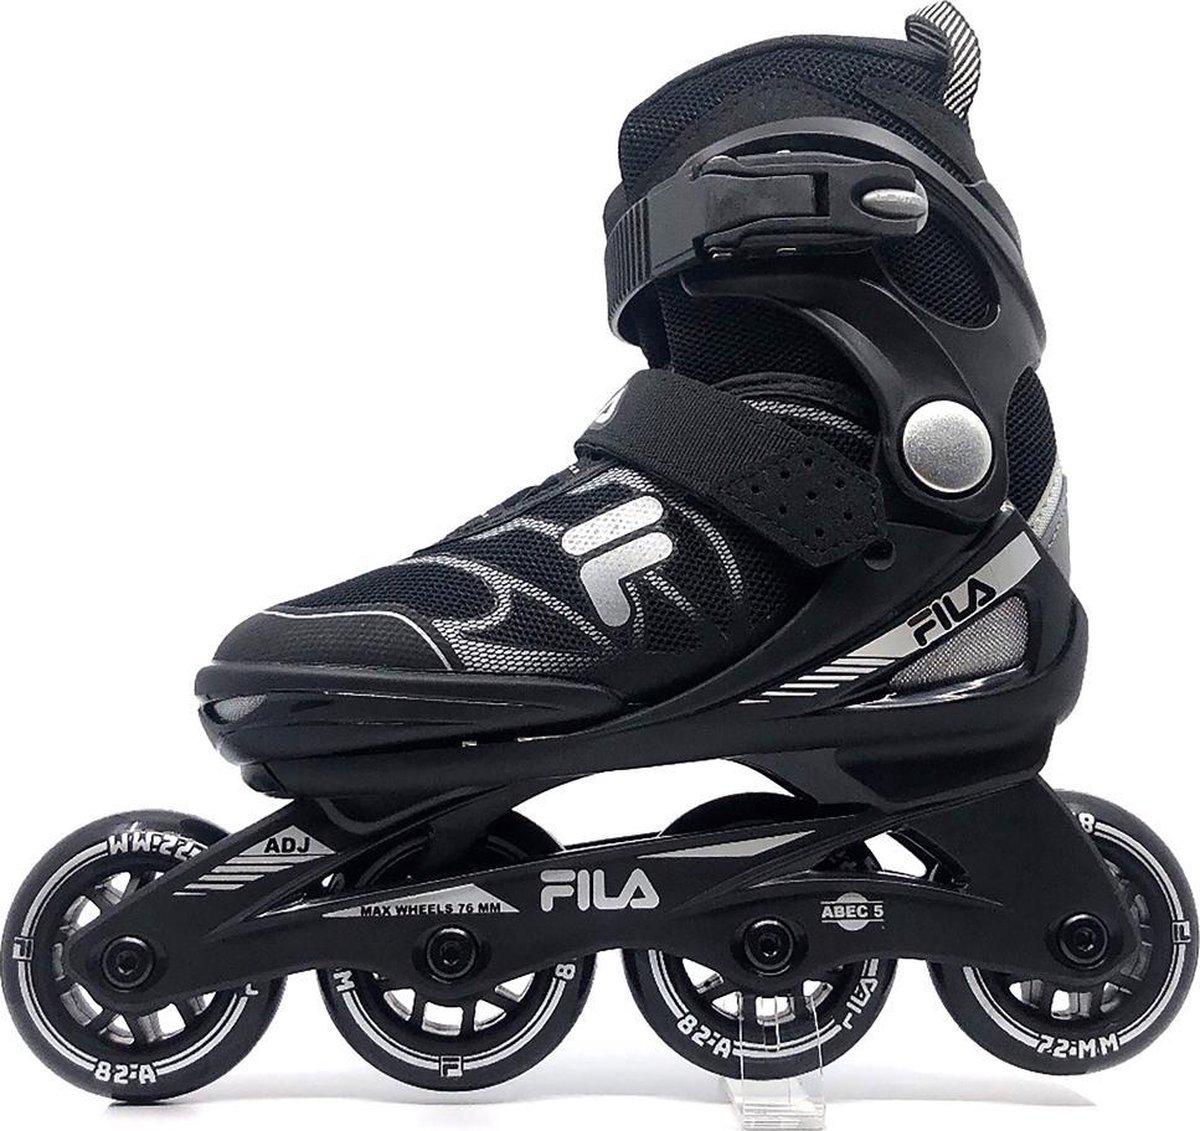 Fila - Verstelbare inline skates - J one - 21' - Maat 28-32 - Zwart - Grijs